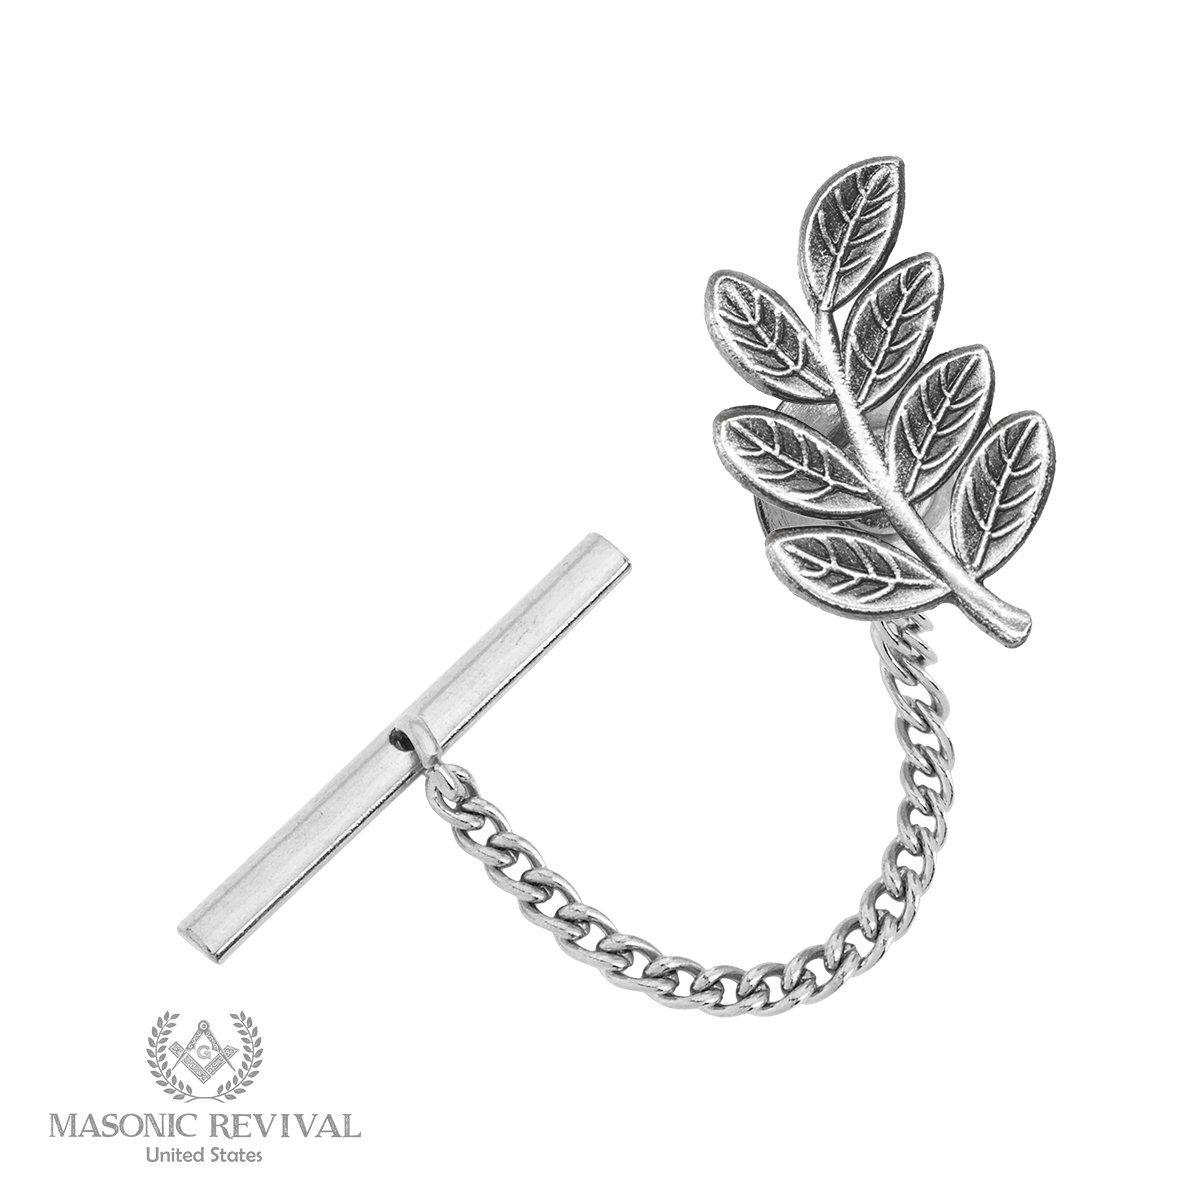 Sprig of Acacia Tie Pin Tack by Masonic Revival (Antique Silver)